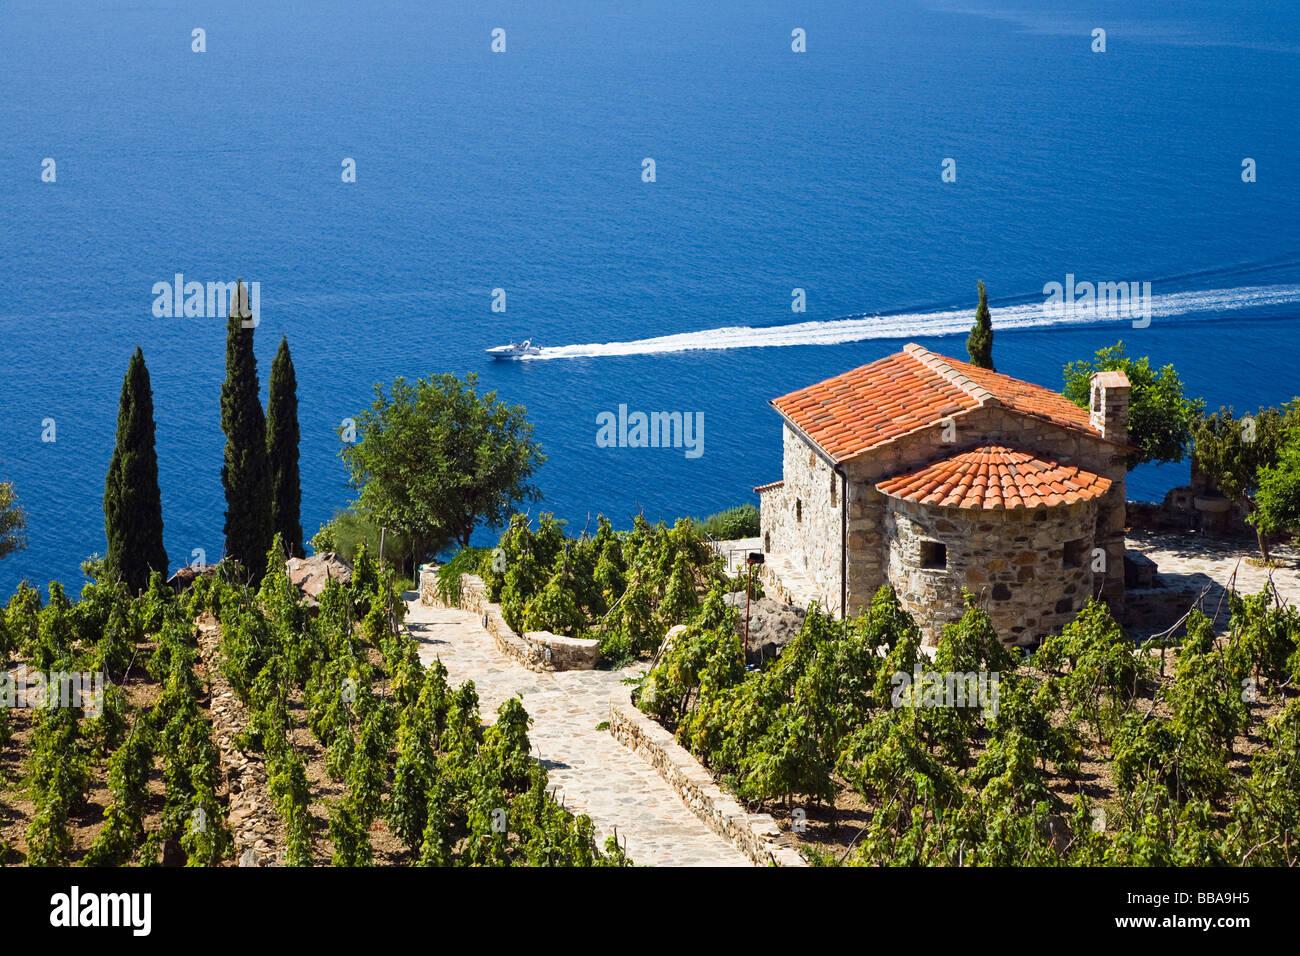 Small villa and vineyard above the coast near Colle d'Orano, Elba, Tuscany, Italy, Mediterranean, Europe - Stock Image